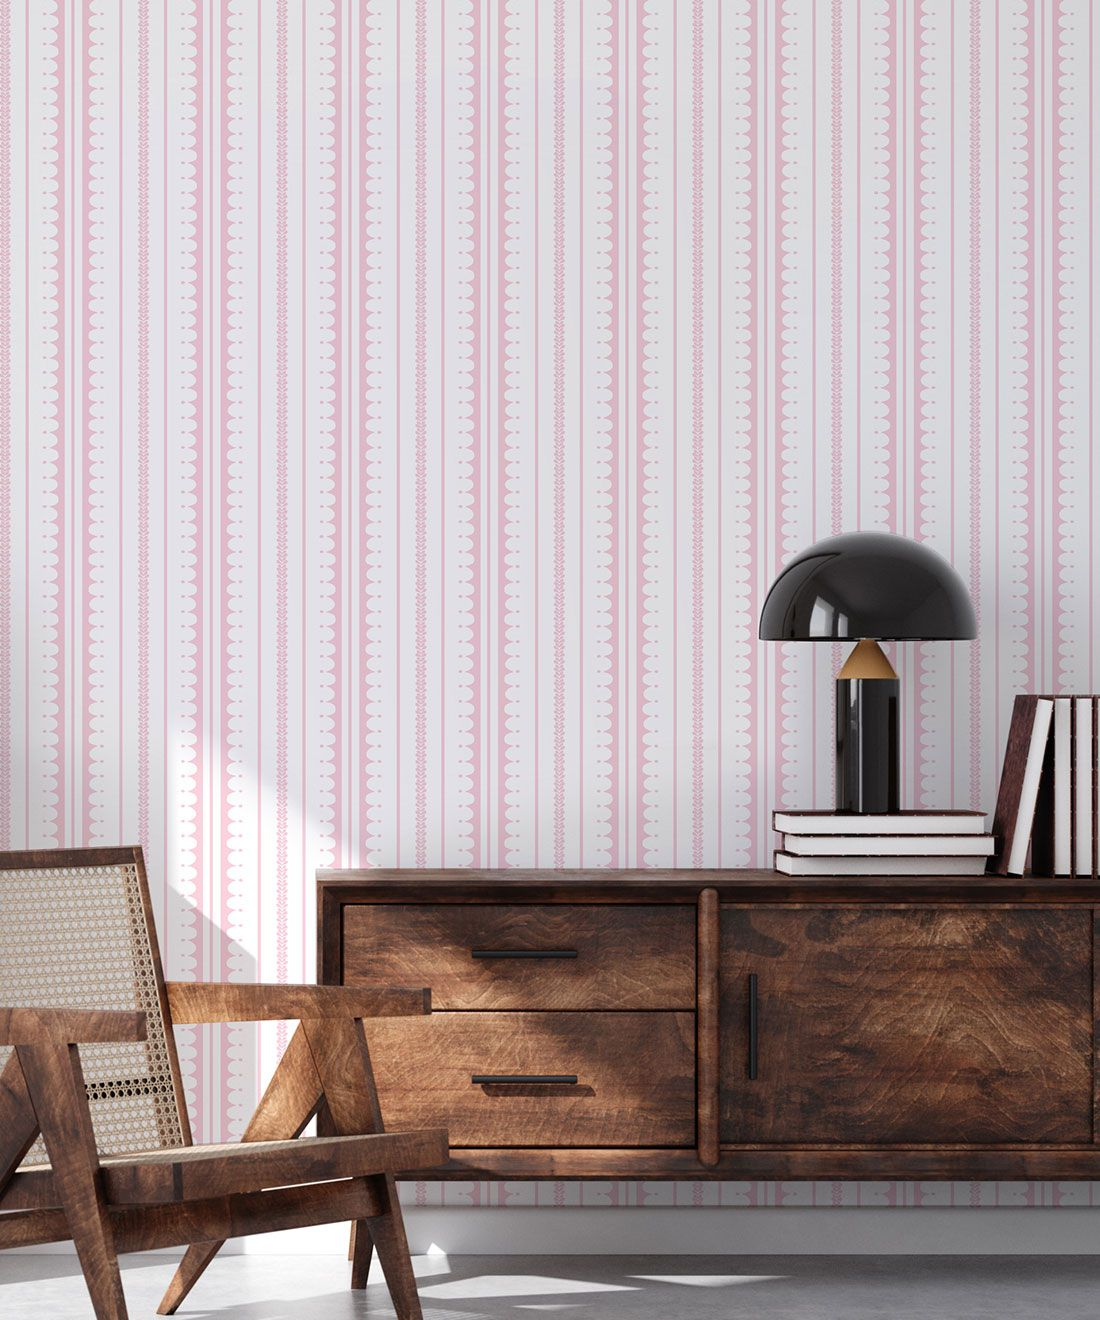 La Grand Coquille • Stripe and Scallop Wallpaper • Blush • Insitu